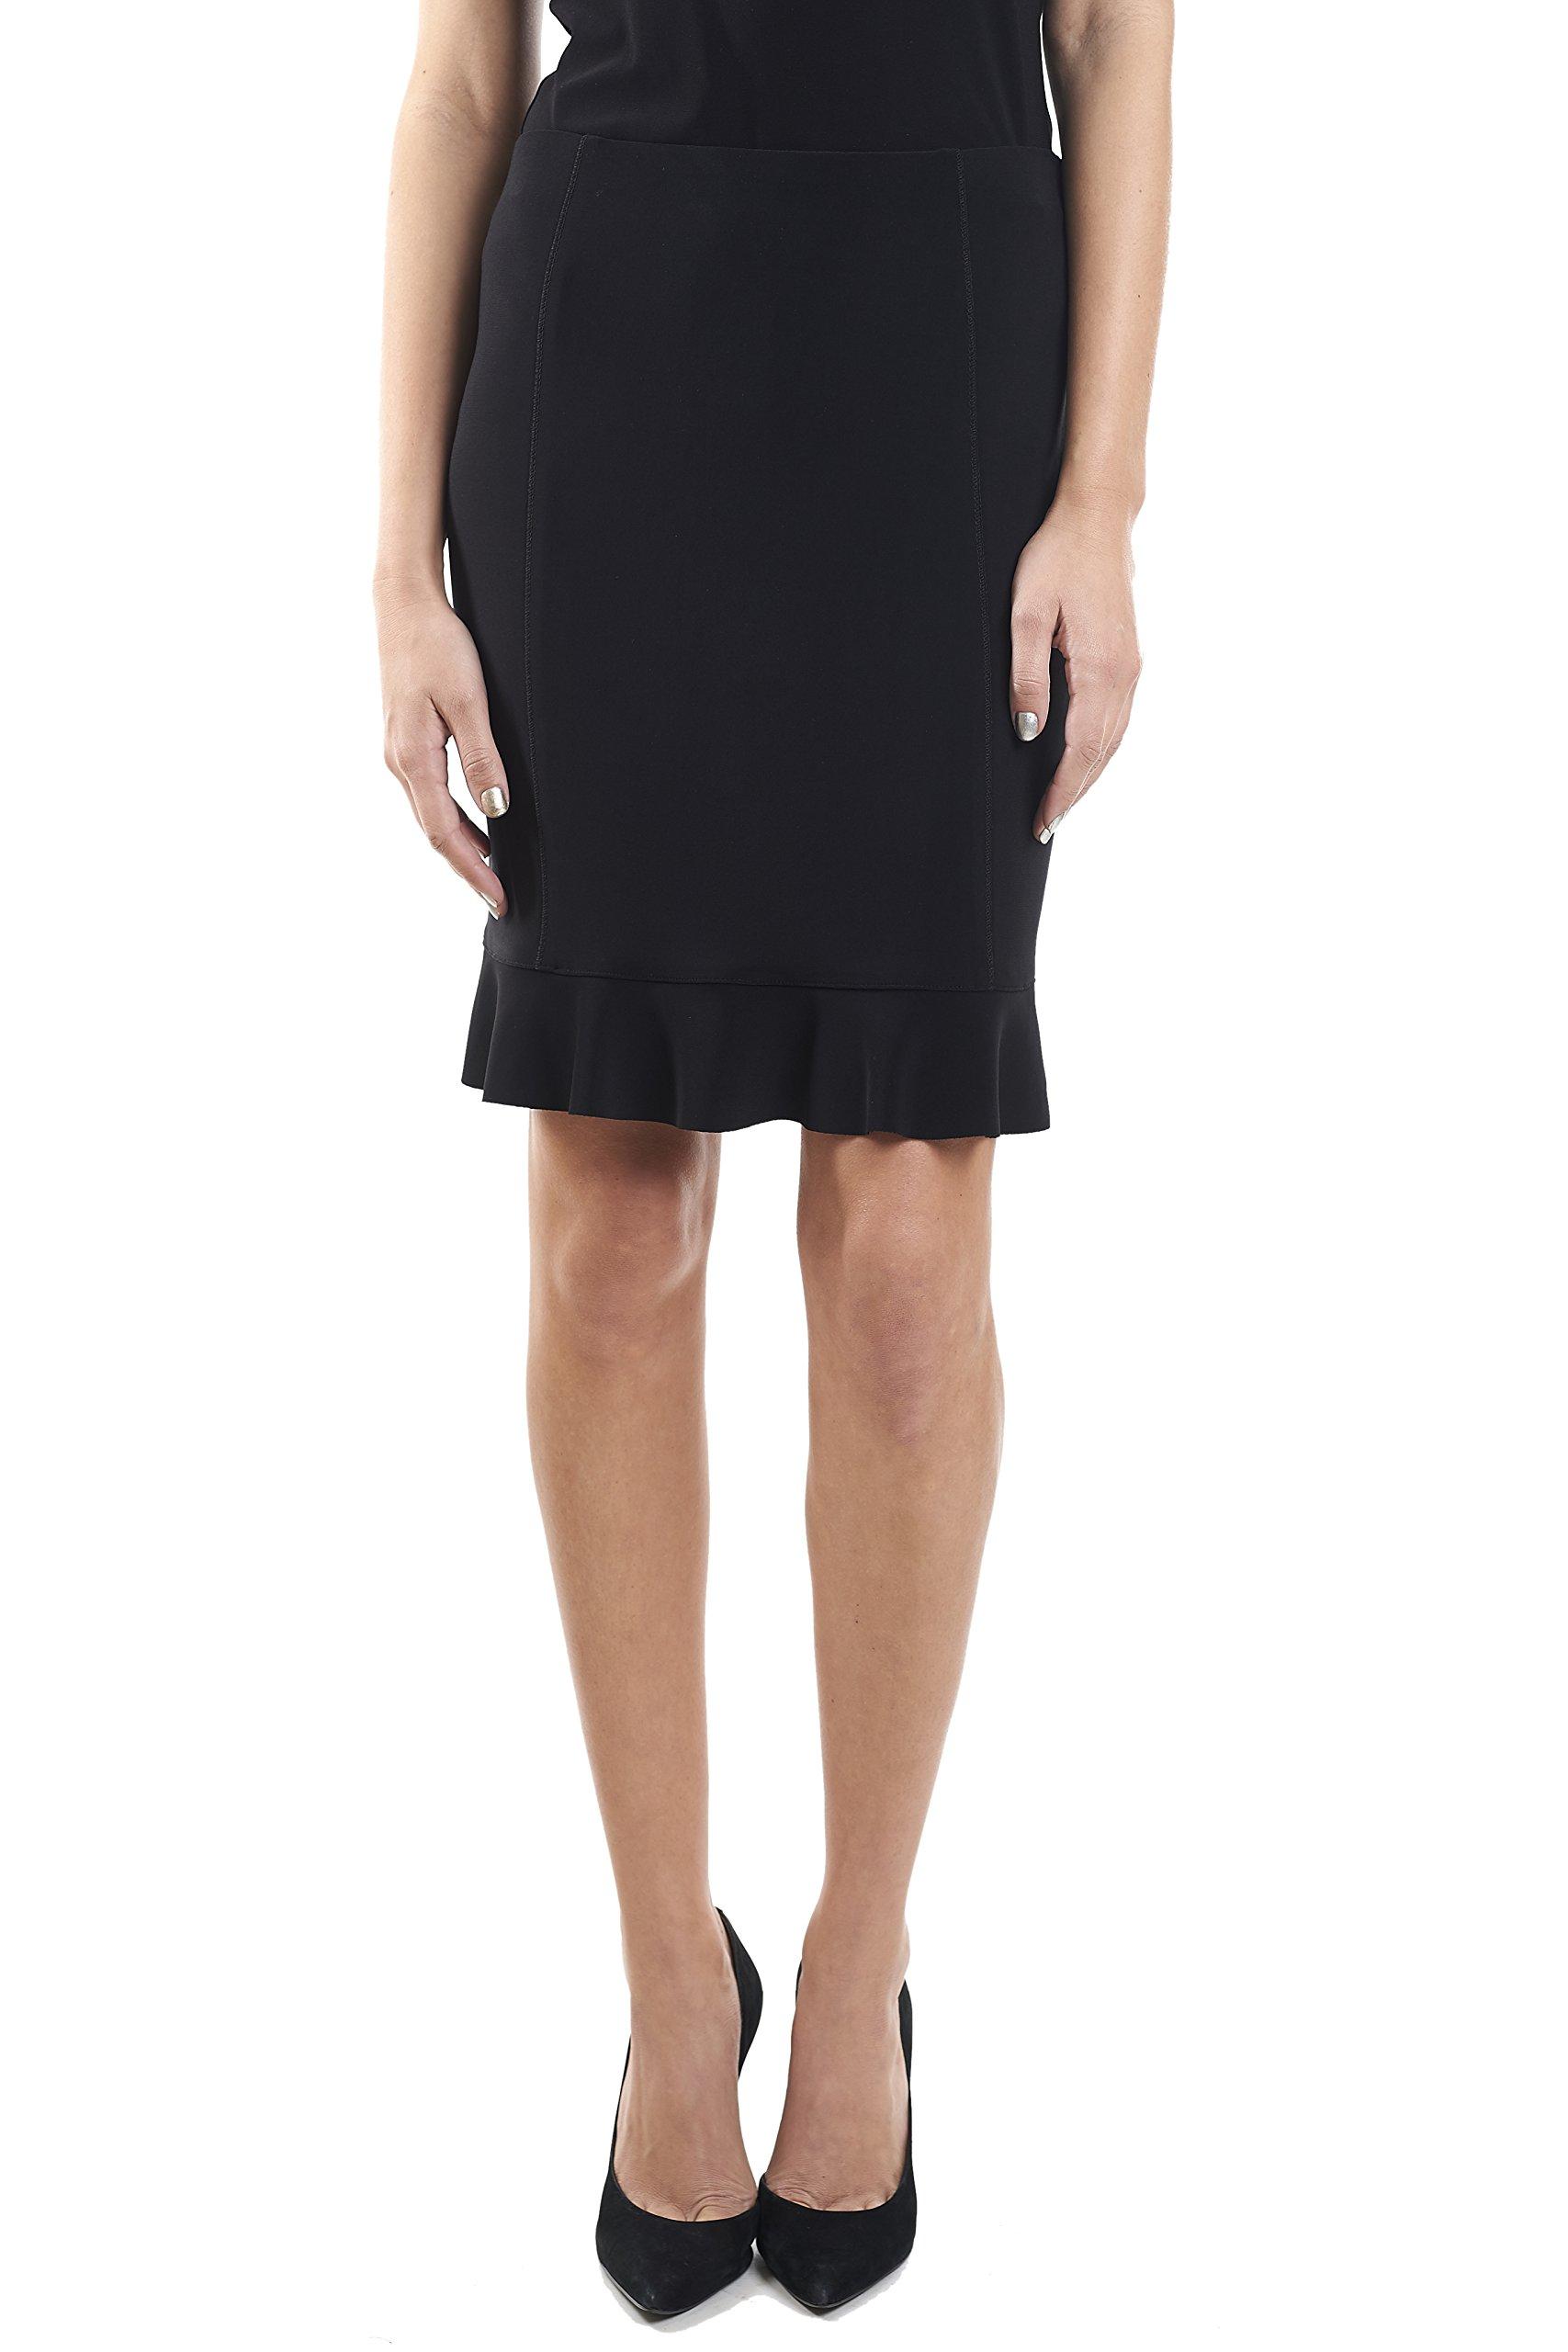 Joseph Ribkoff Black Ruffle Hem Skirt Style 161080 - Size 14